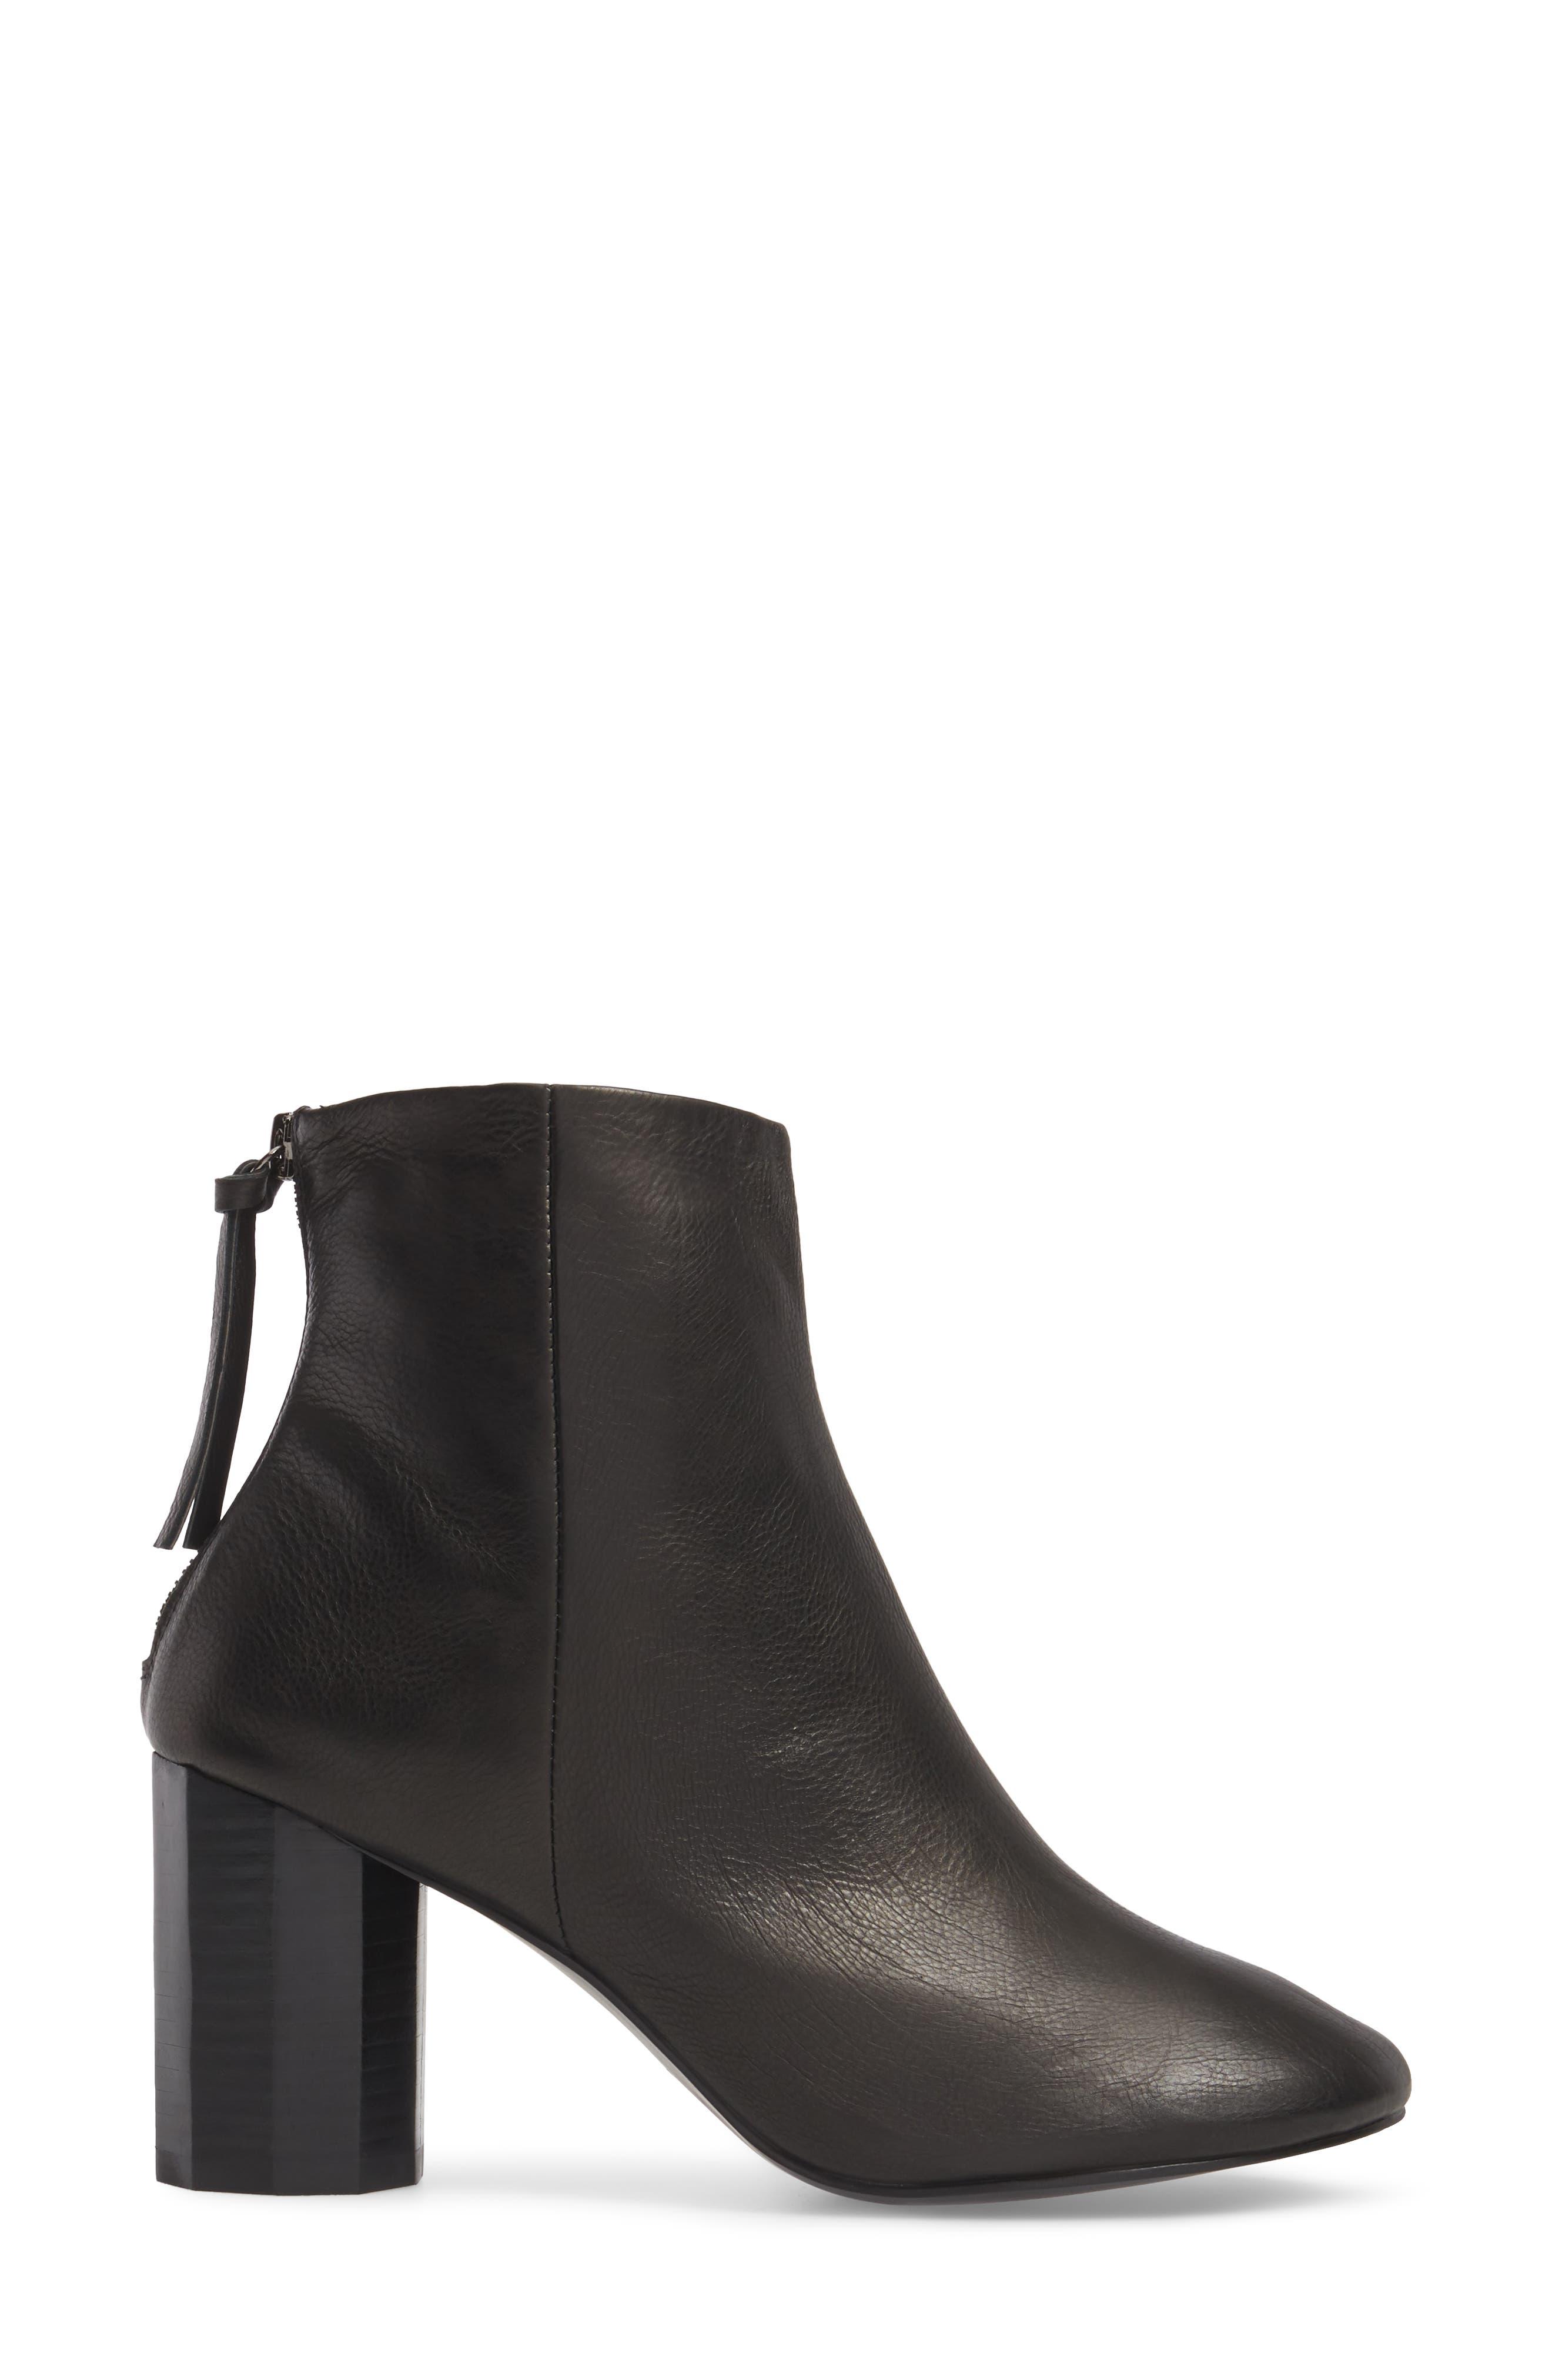 Sadie Column Heel Bootie,                             Alternate thumbnail 3, color,                             Black Leather